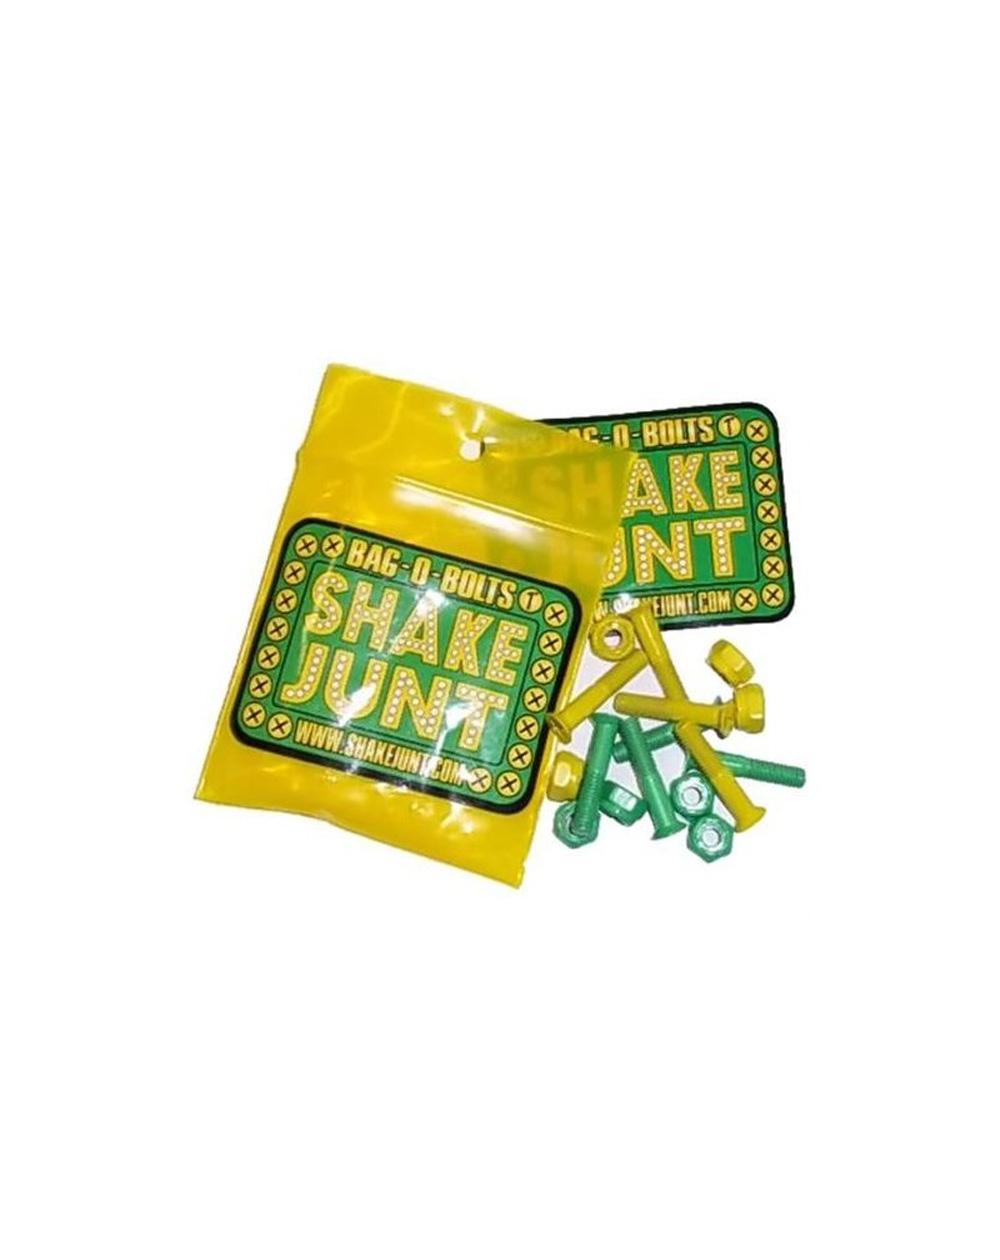 Shake Junt Visserie Skateboard Bag o' Bolts Allen Green/Yellow